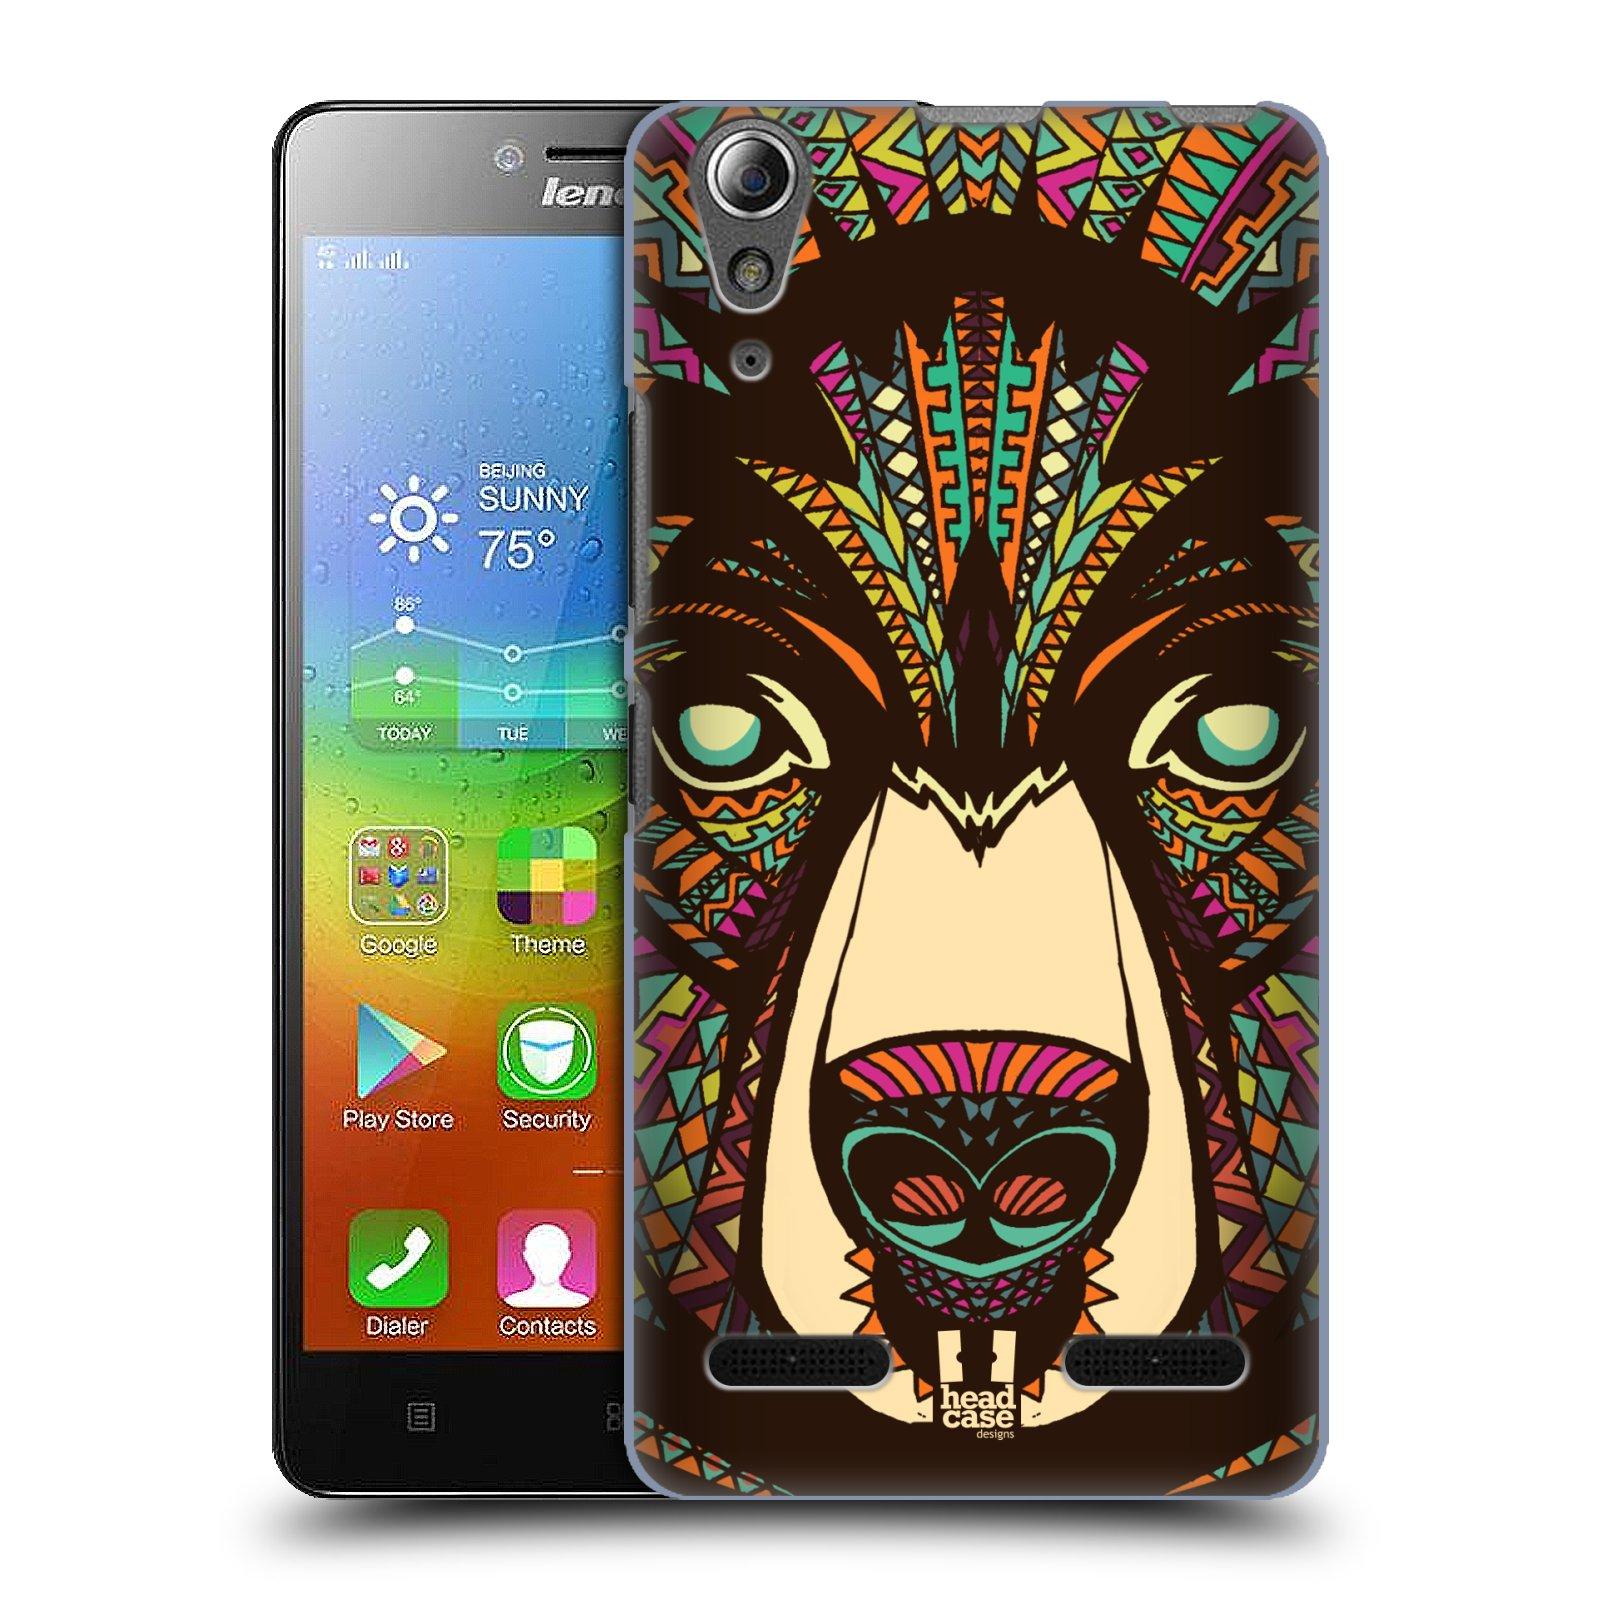 HEAD CASE pevný plastový obal na mobil LENOVO A6000 / A6000 PLUS vzor Aztécký motiv zvíře medvěd